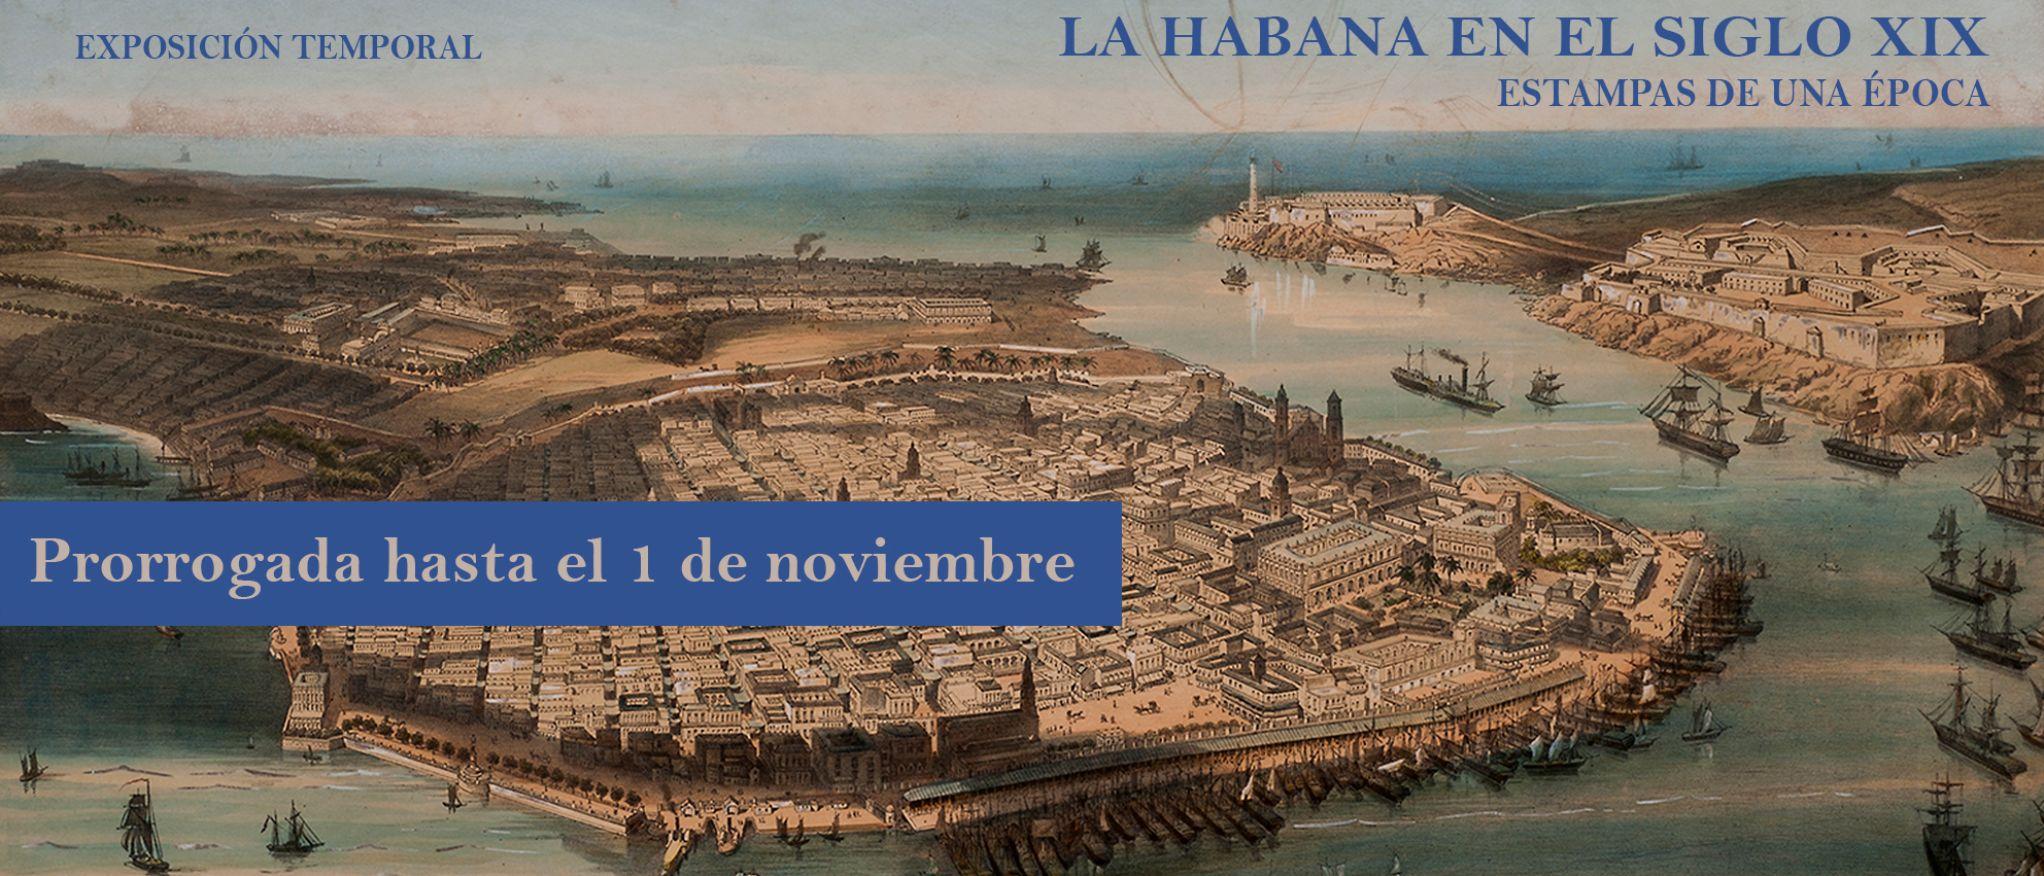 La Habana en el siglo XIX. Museo de América.